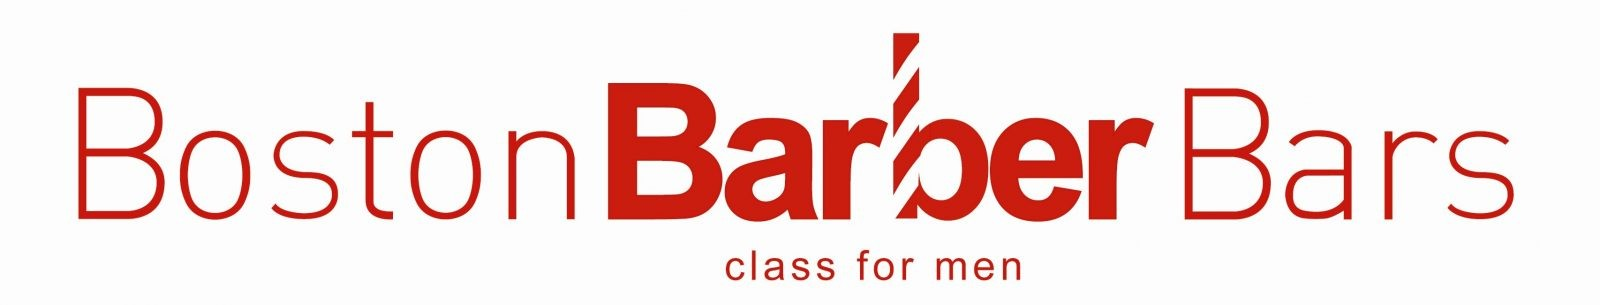 boston_brandbars_barber_logo_-_cropped